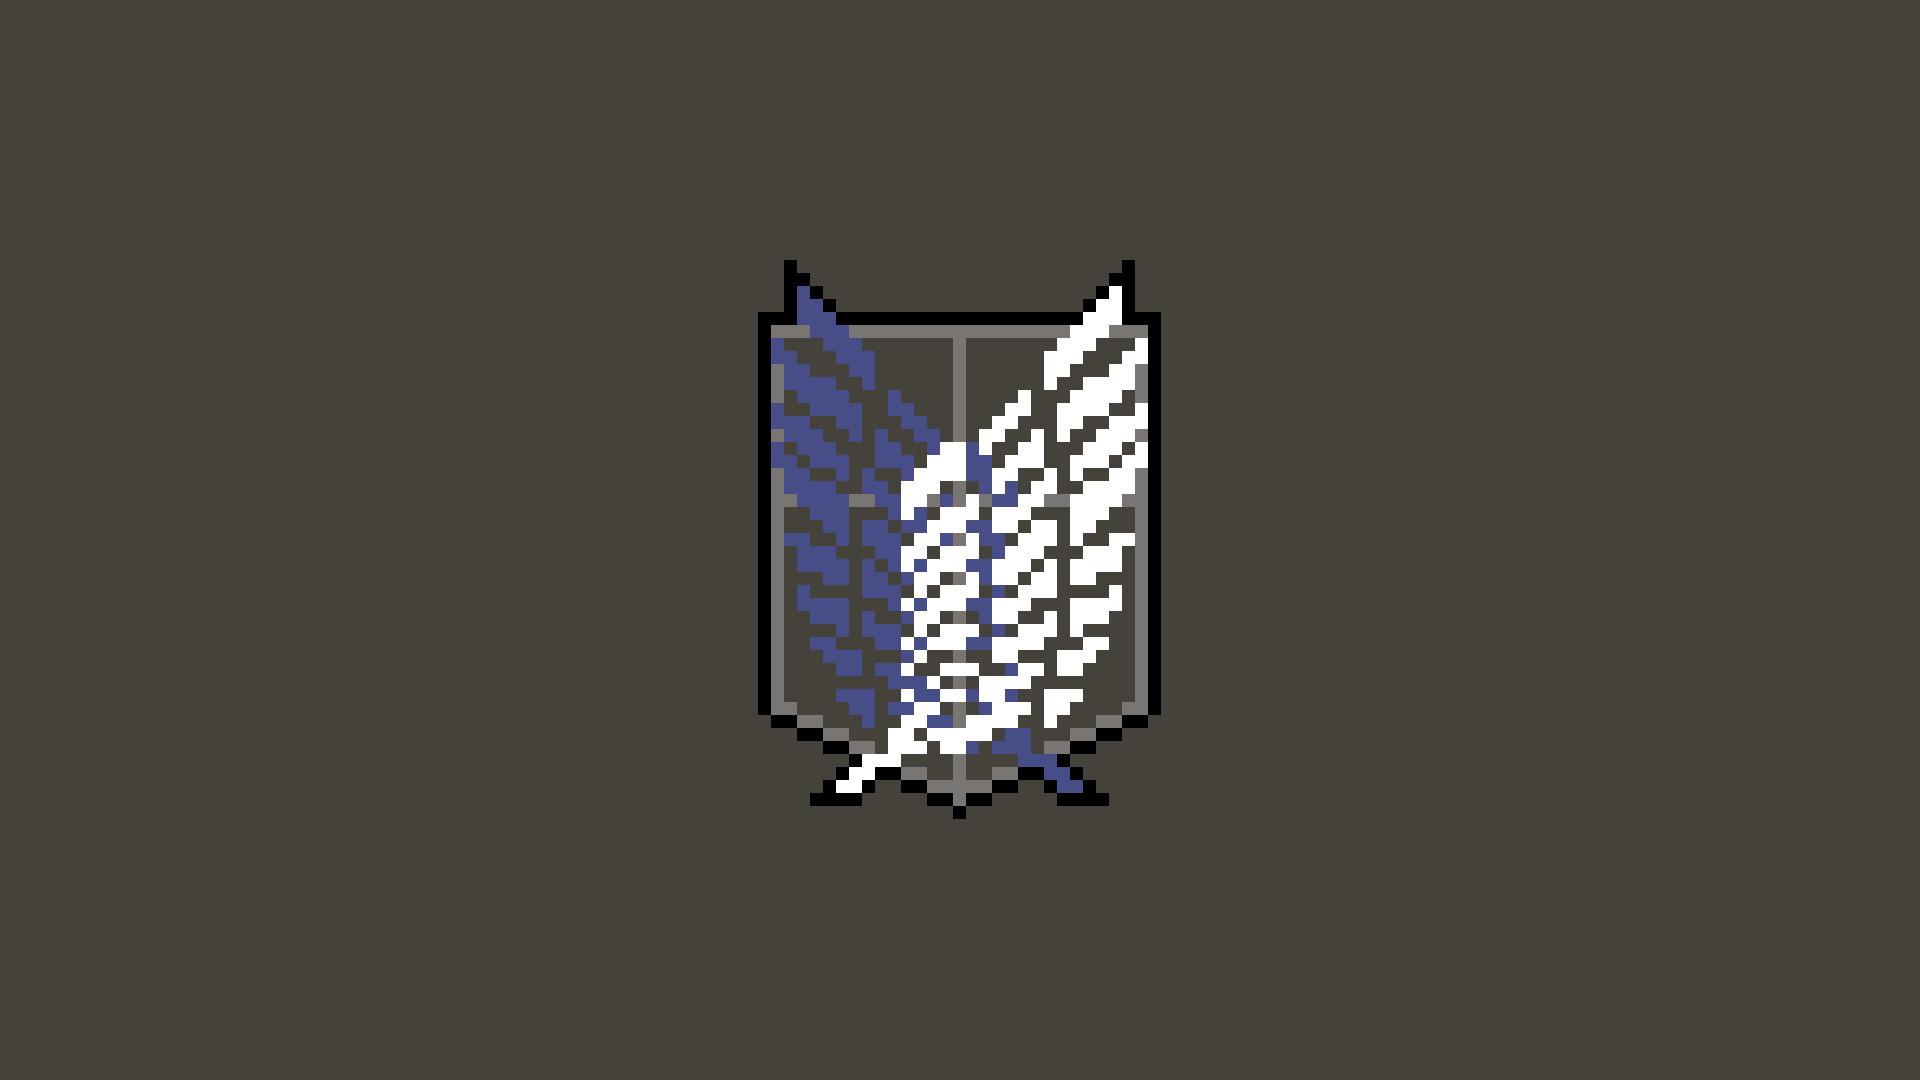 pixel art, Pixels, Shingeki no Kyojin, Scouting legion Wallpapers HD /  Desktop and Mobile Backgrounds